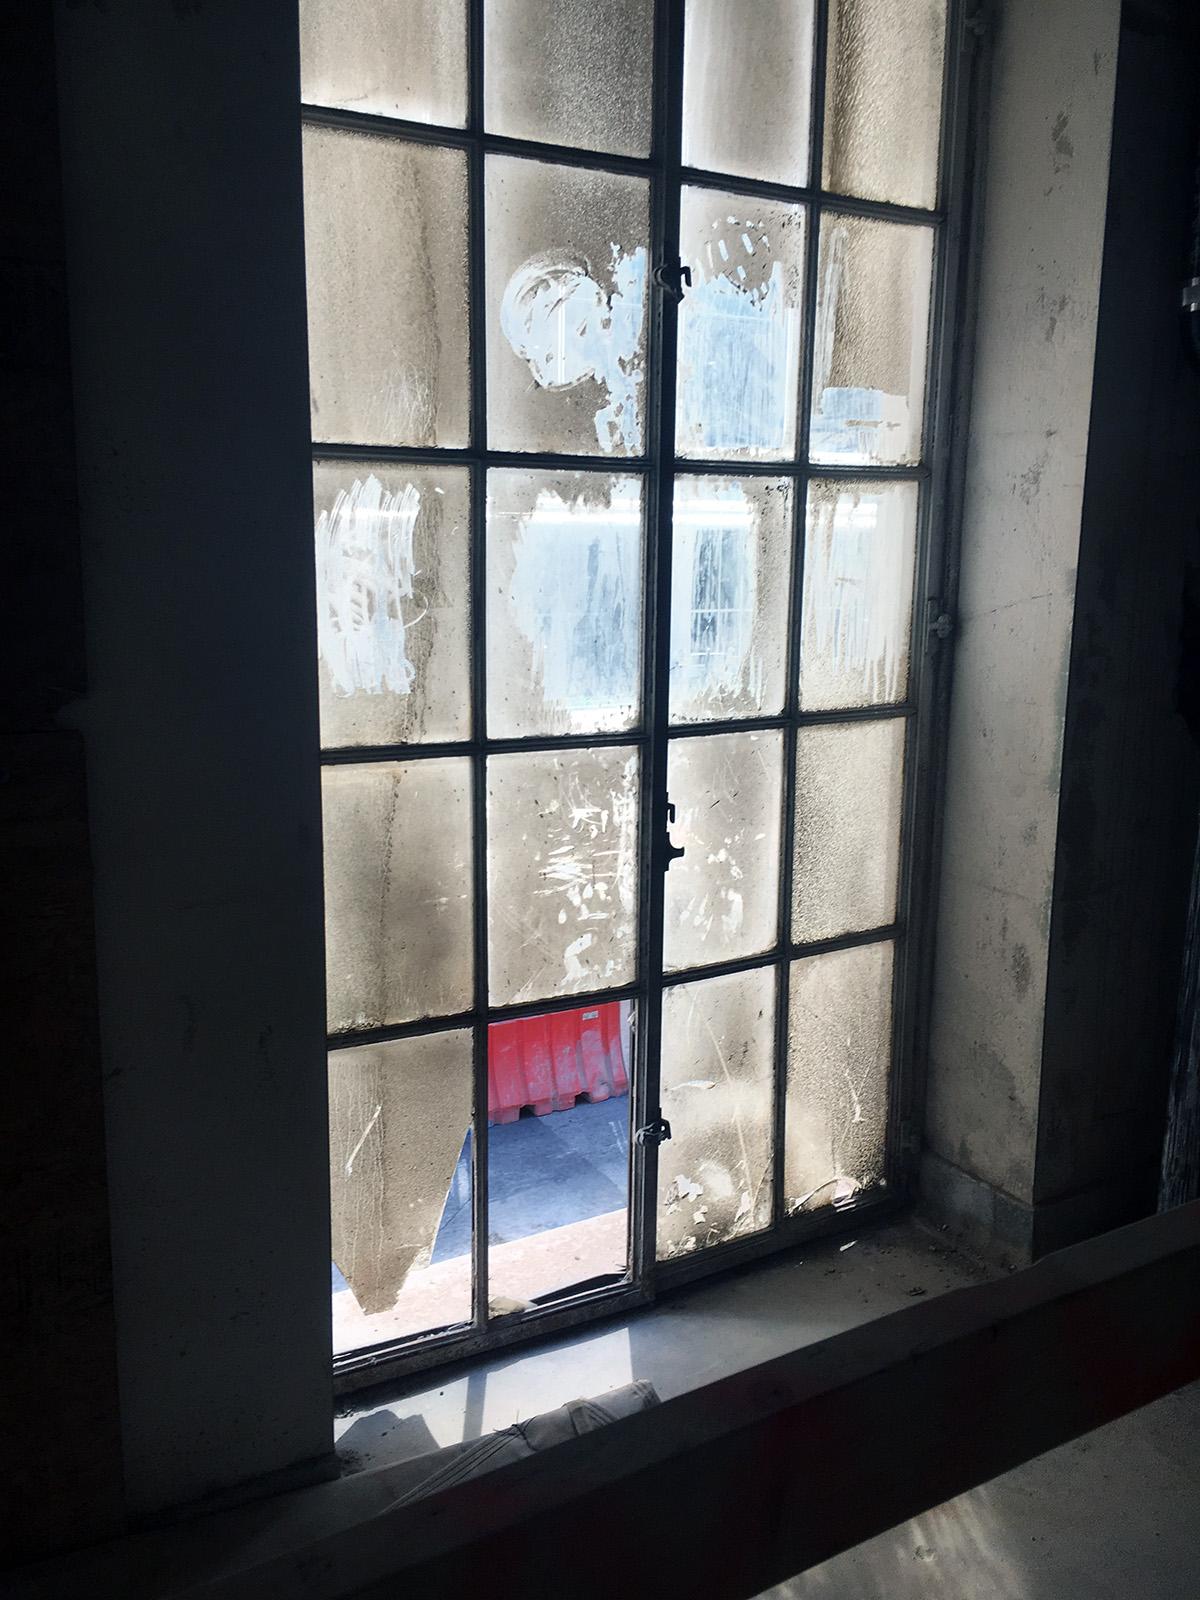 Mid-Elm-Lofts-Project-Shower-Doors-Dallas-7.jpg